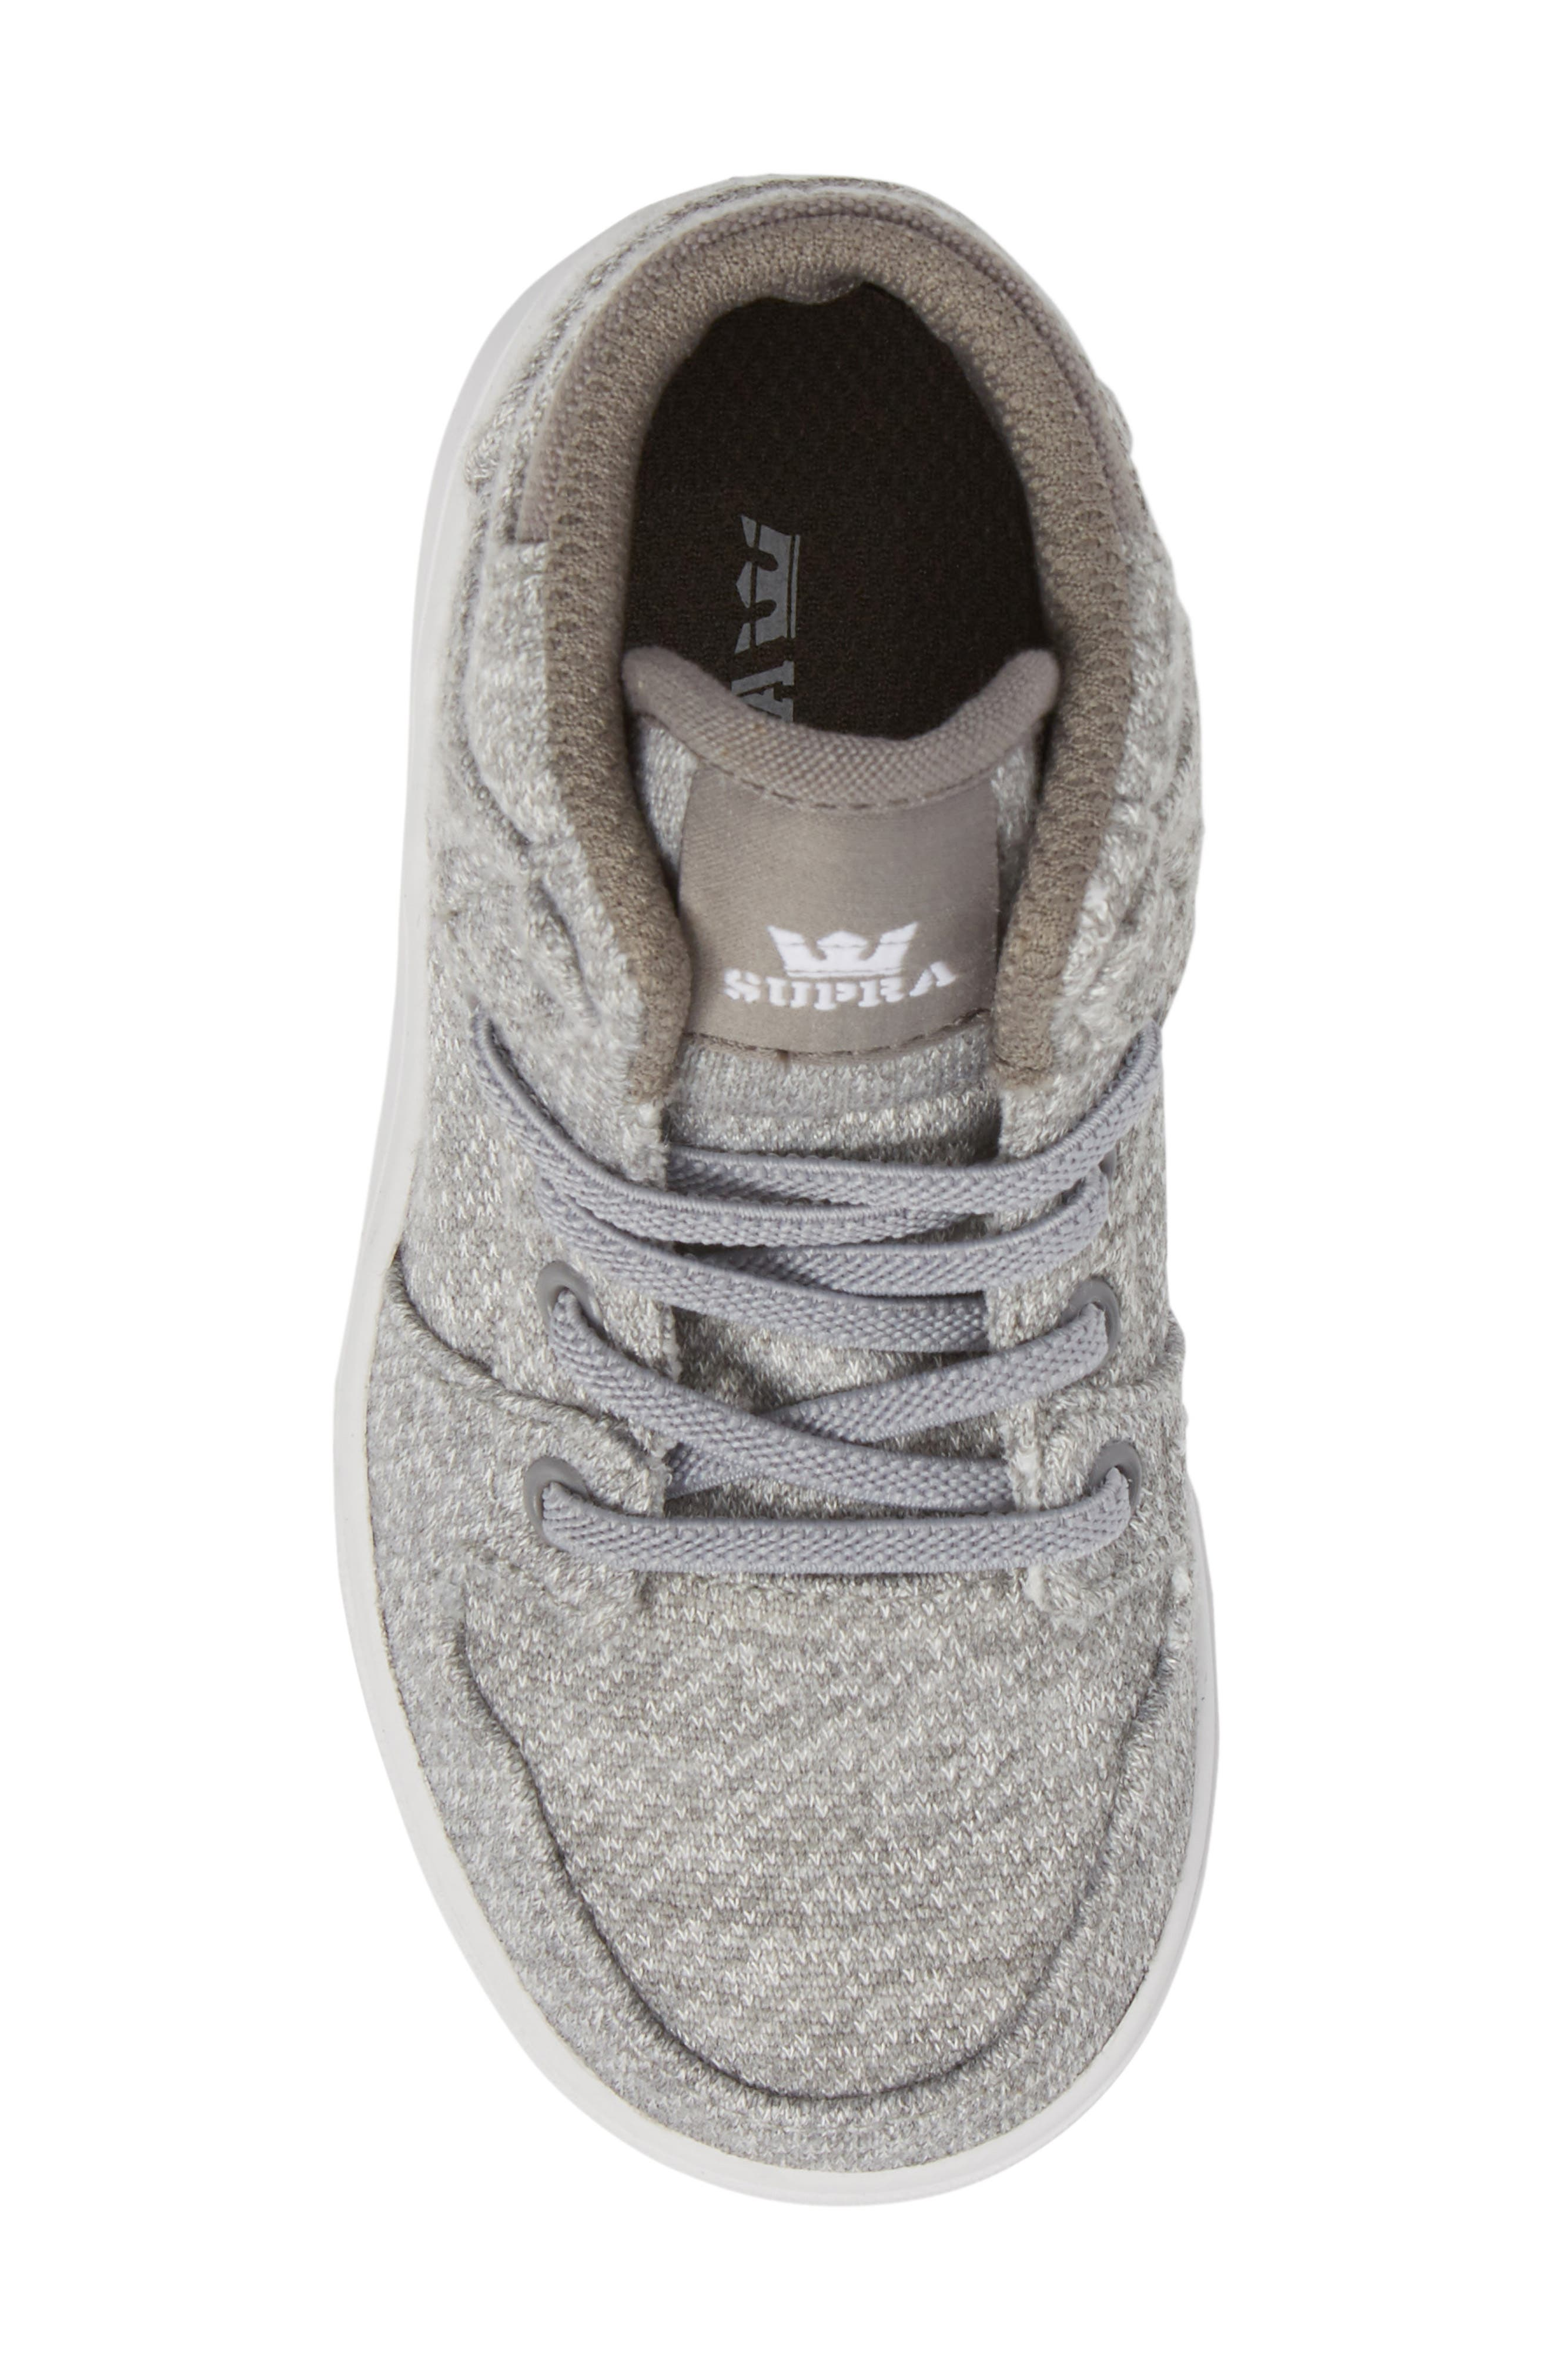 'Vaider' High Top Sneaker,                             Alternate thumbnail 4, color,                             Silver